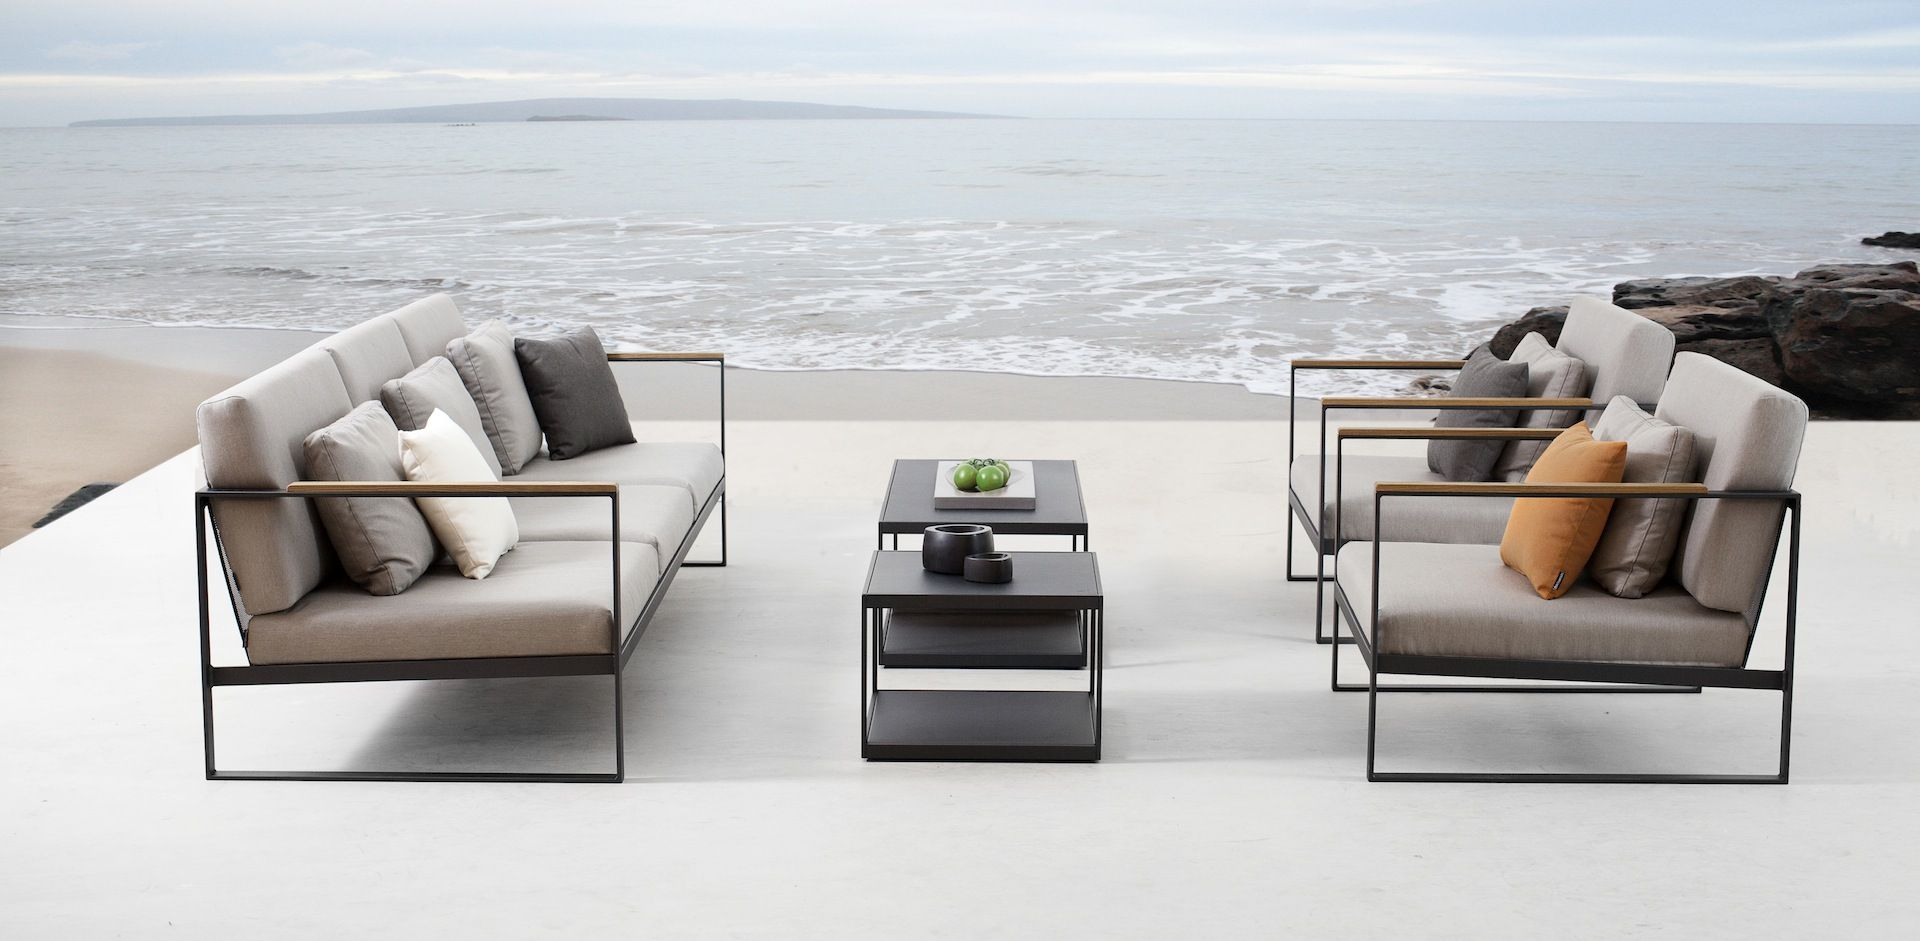 Bilderesultat for røshults hagemøbler   Outdoor - furniture/garden ...